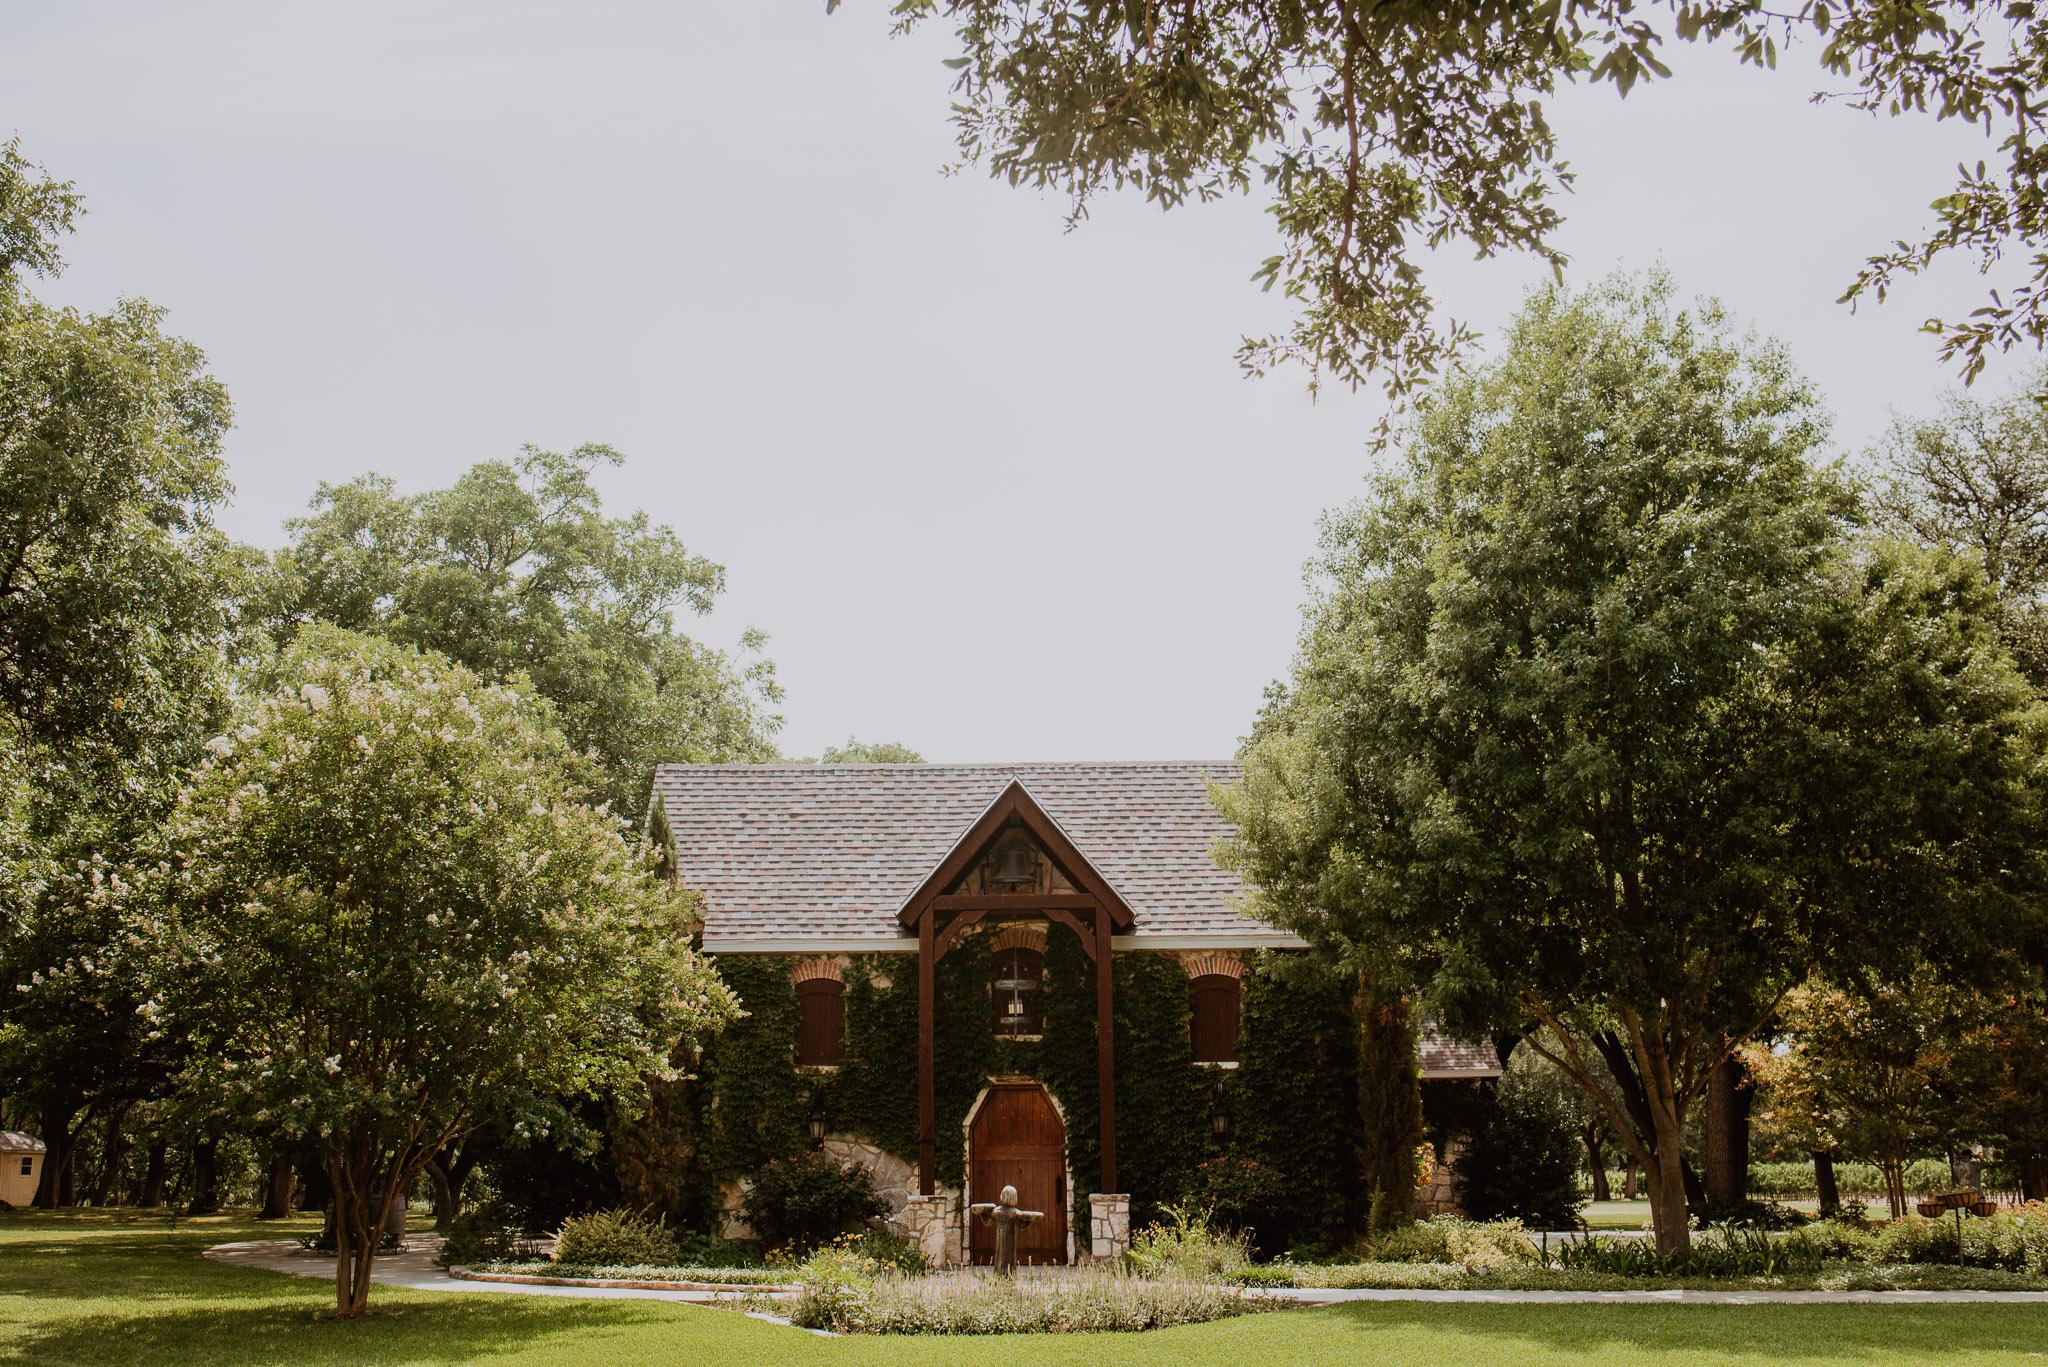 Christoval-vineyard-wedding-heather-justin-0001.jpg